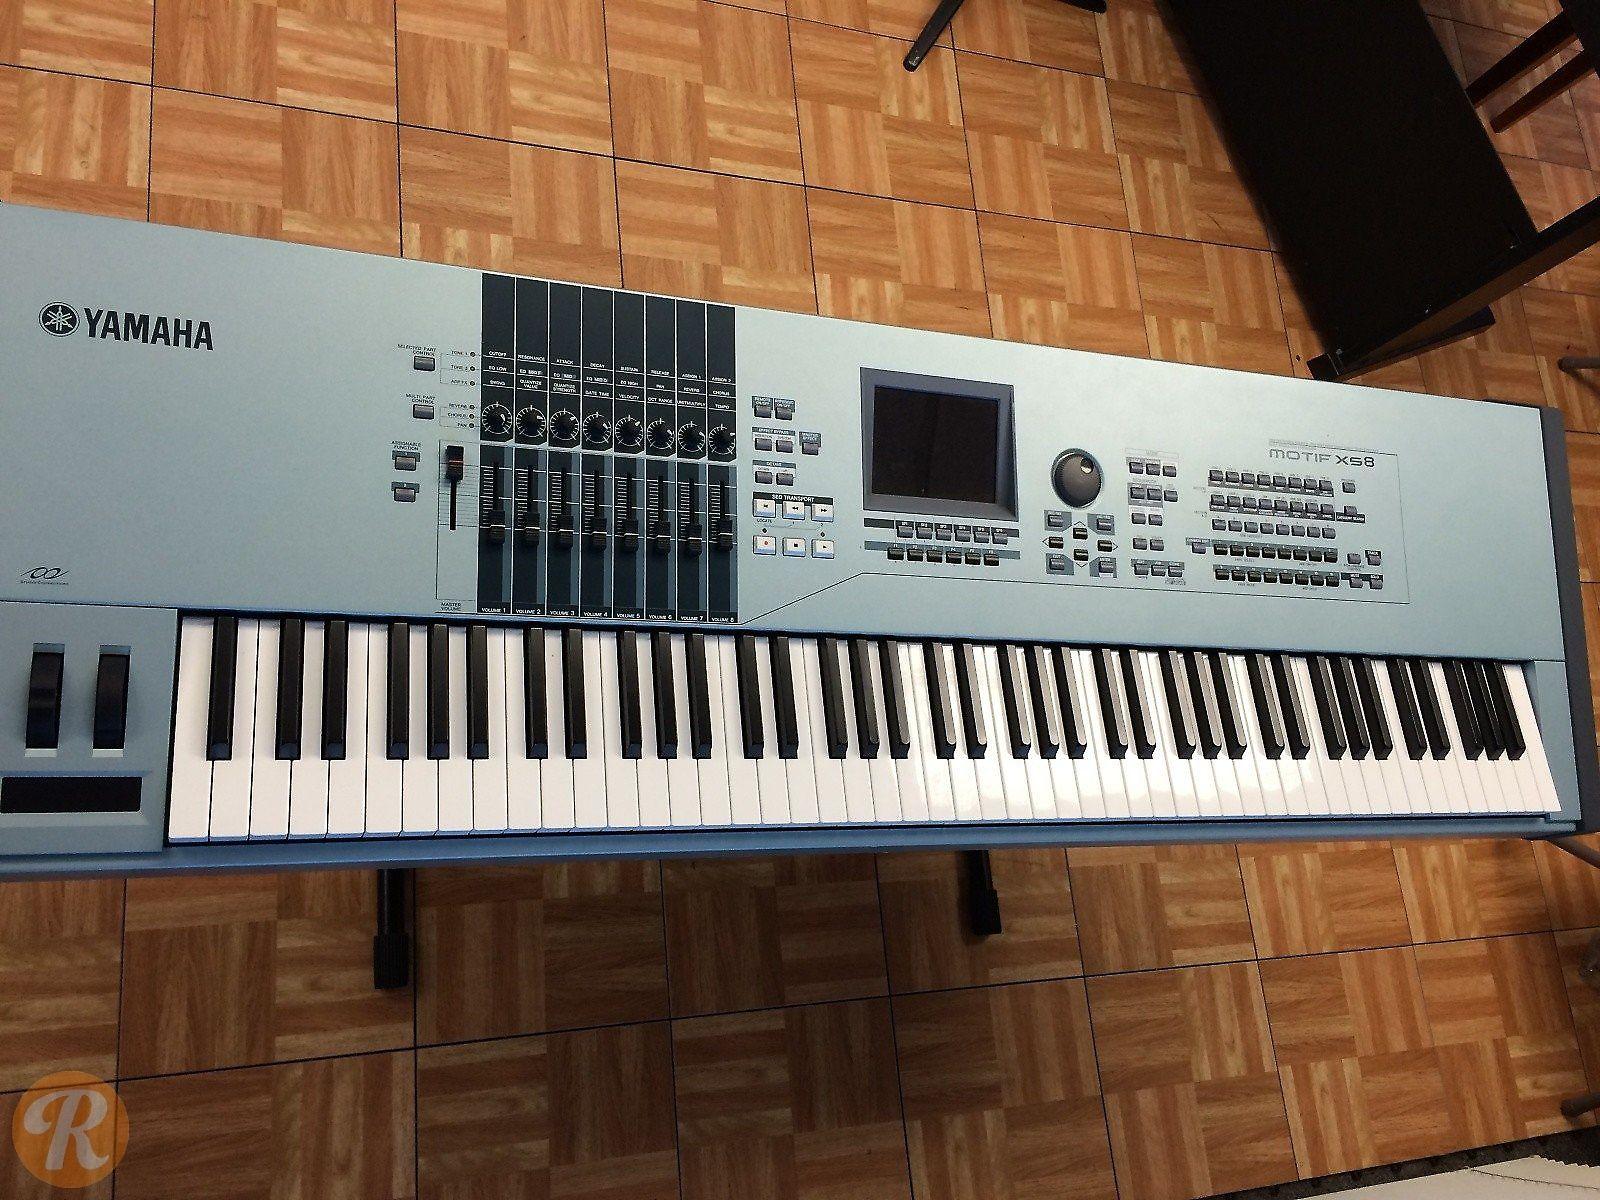 Yamaha Motif XS 8 Workstation | Reverb